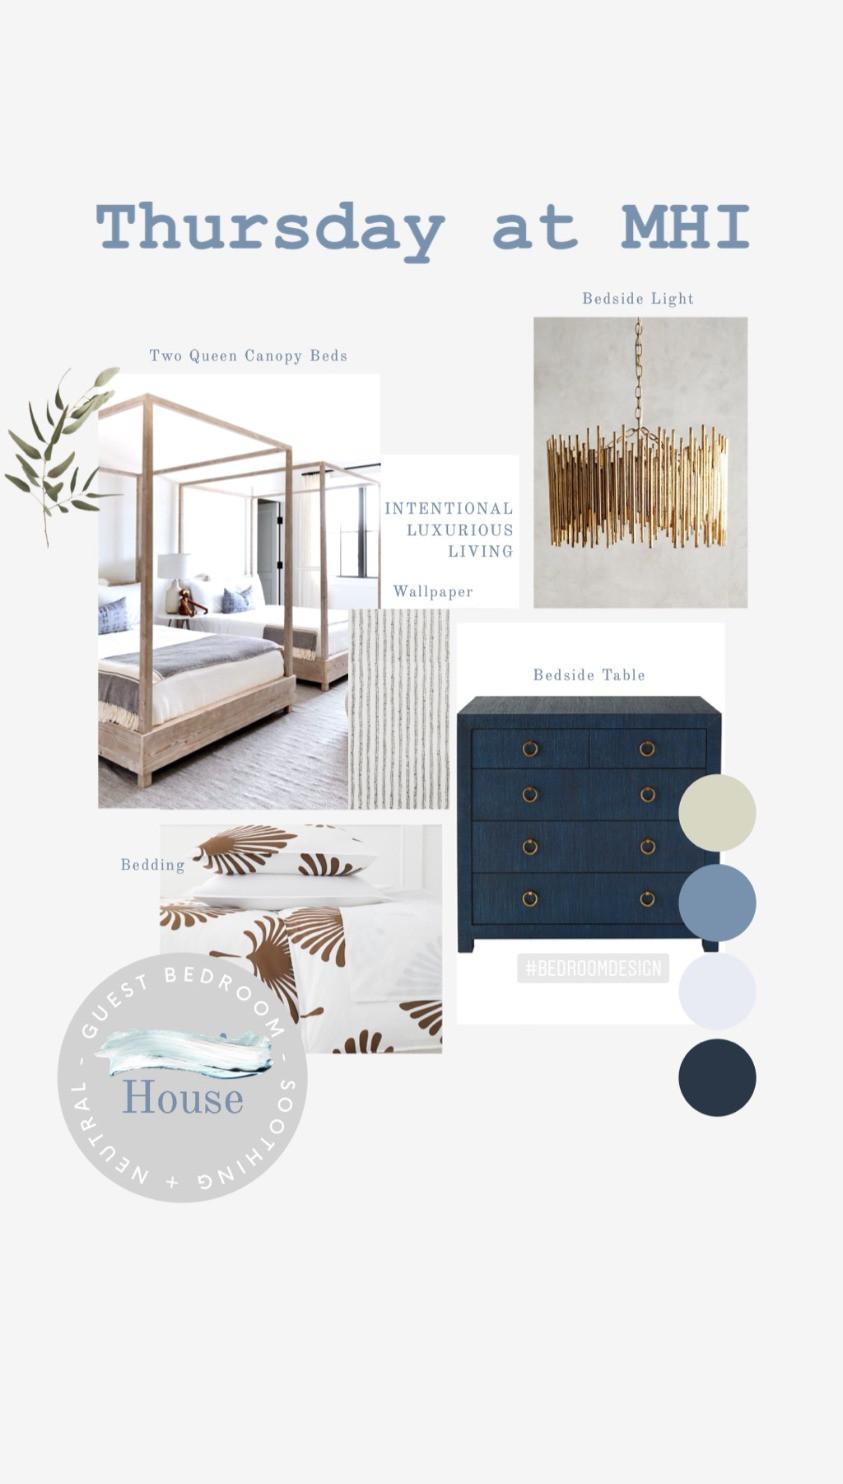 Thursday+at+MHI+--+Guest+Bedroom+Sneak+Peek+--+Mary+Hannah+Interiors+--+Studio+Blog